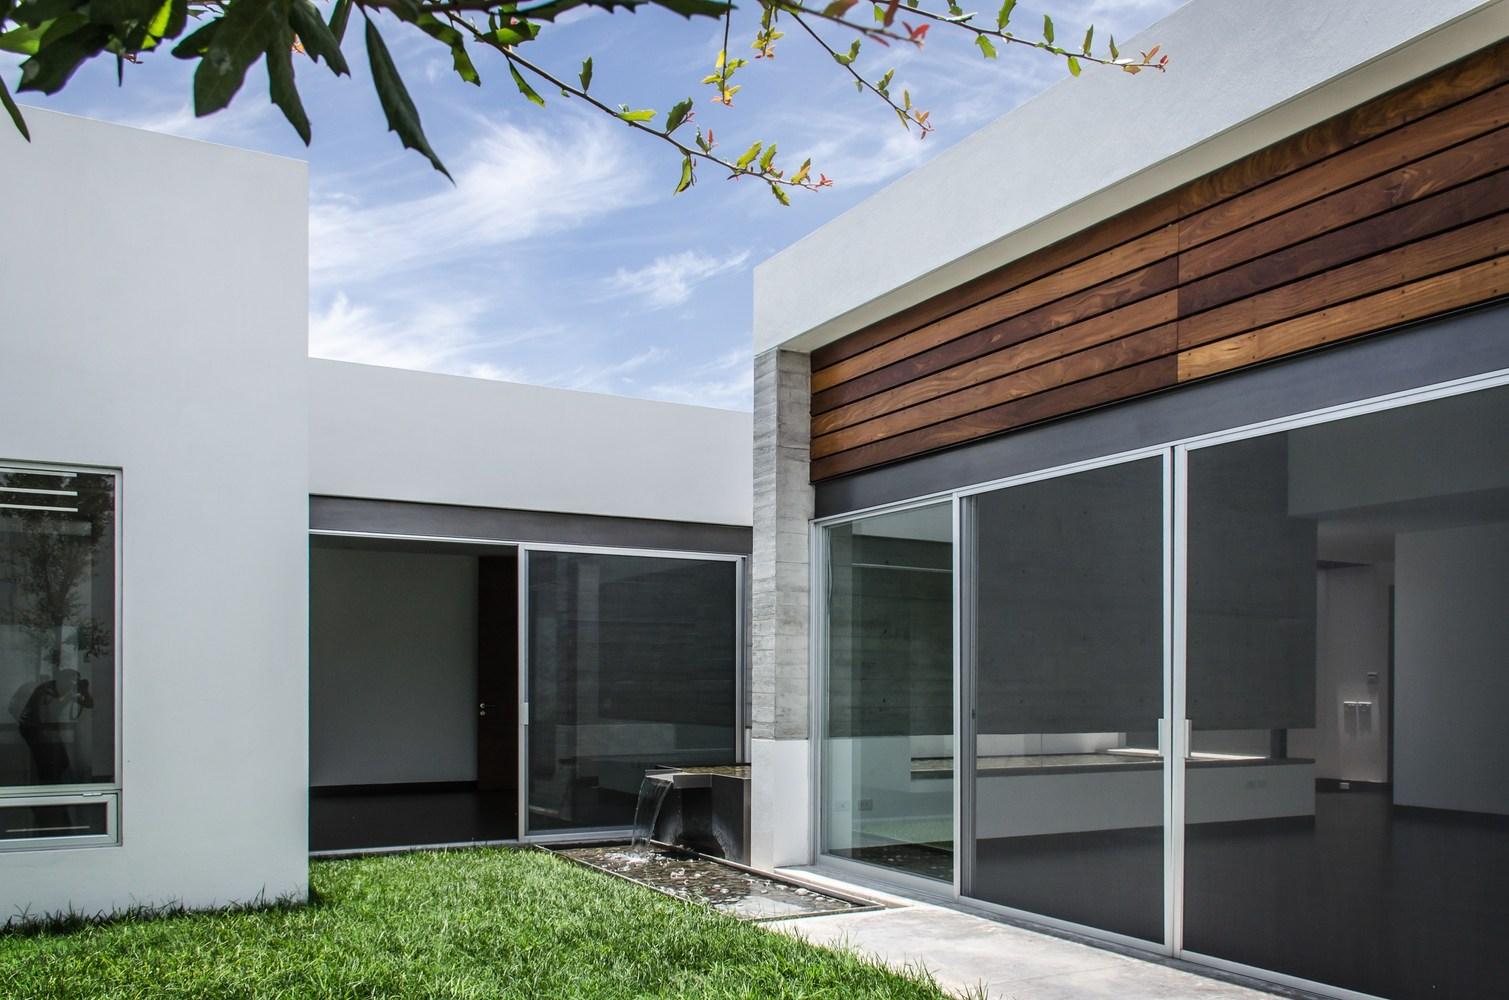 House t02 by adi architecture and interior design in mexico for Casa moderna design